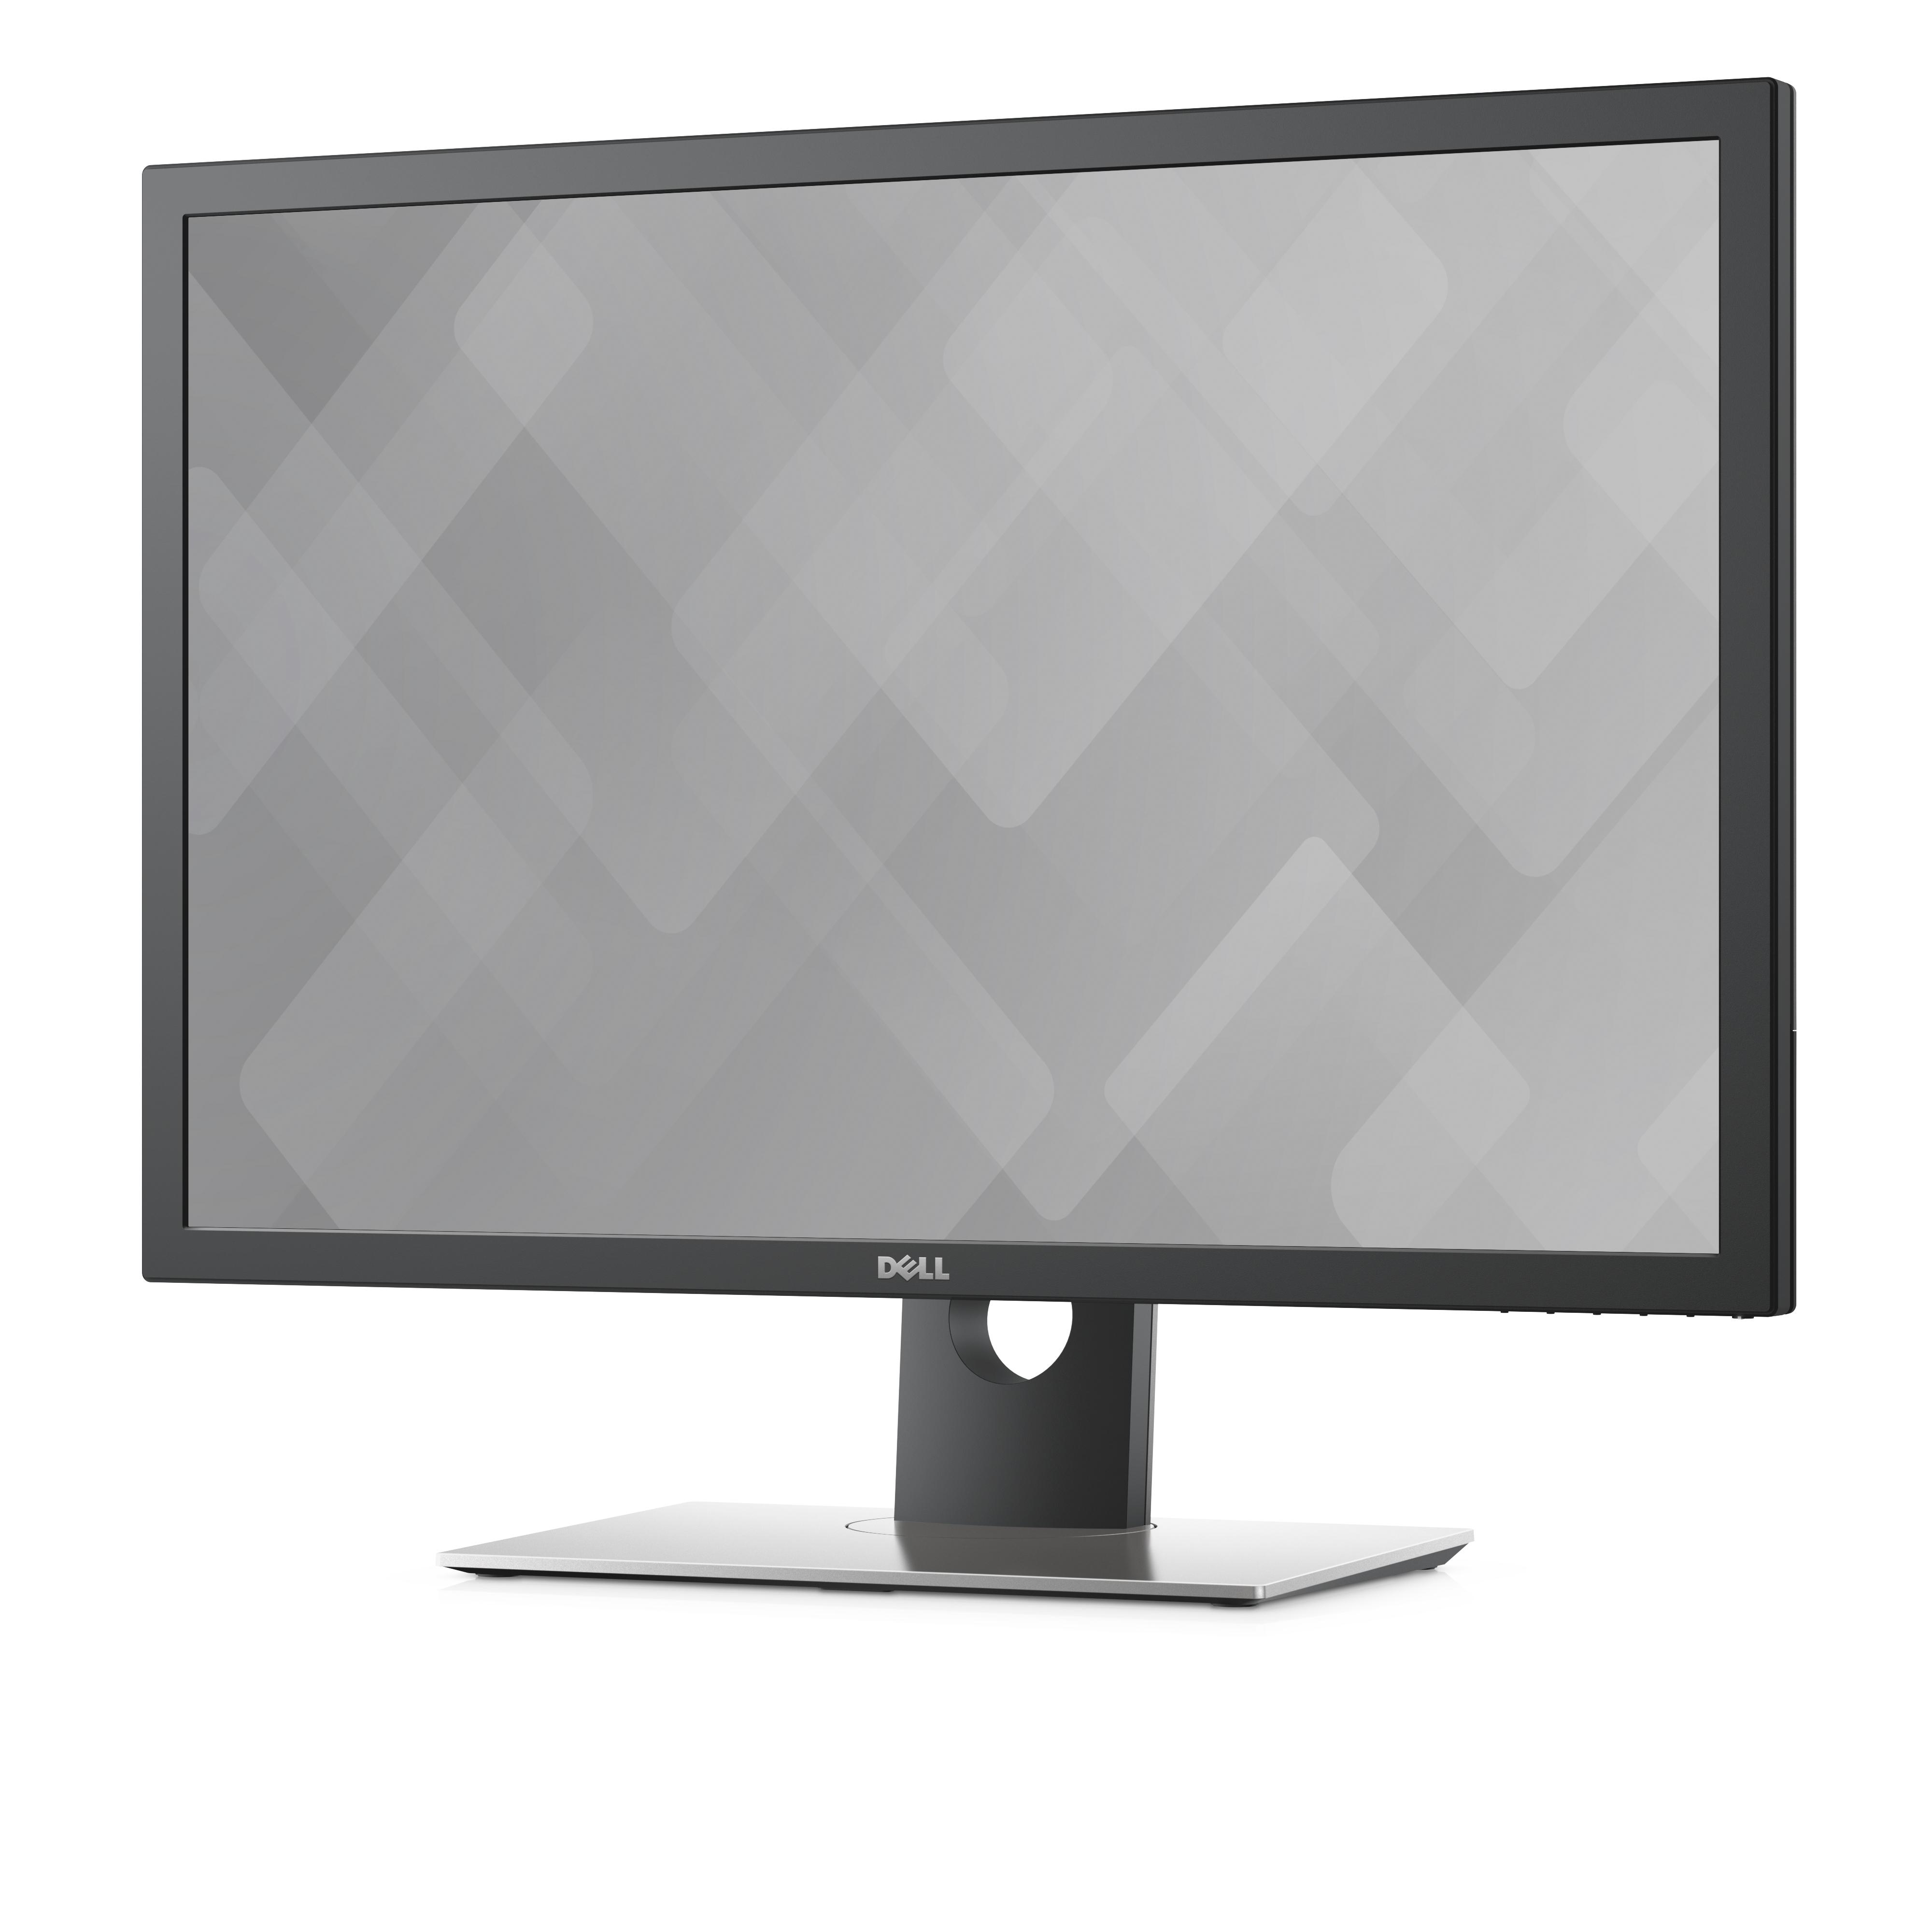 Dell UltraSharp UP3017 - LED-Monitor - 75.62 cm (30